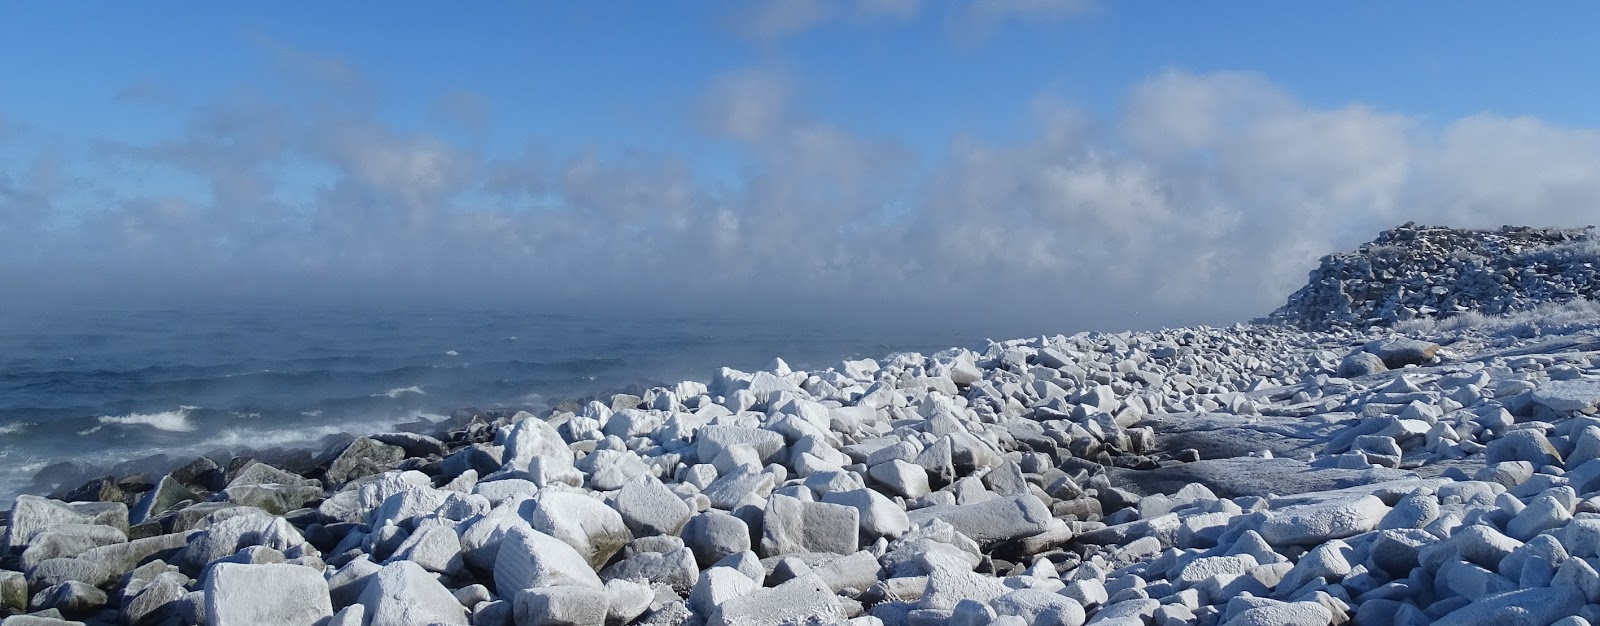 Netherworld - Alchemy Of Ice